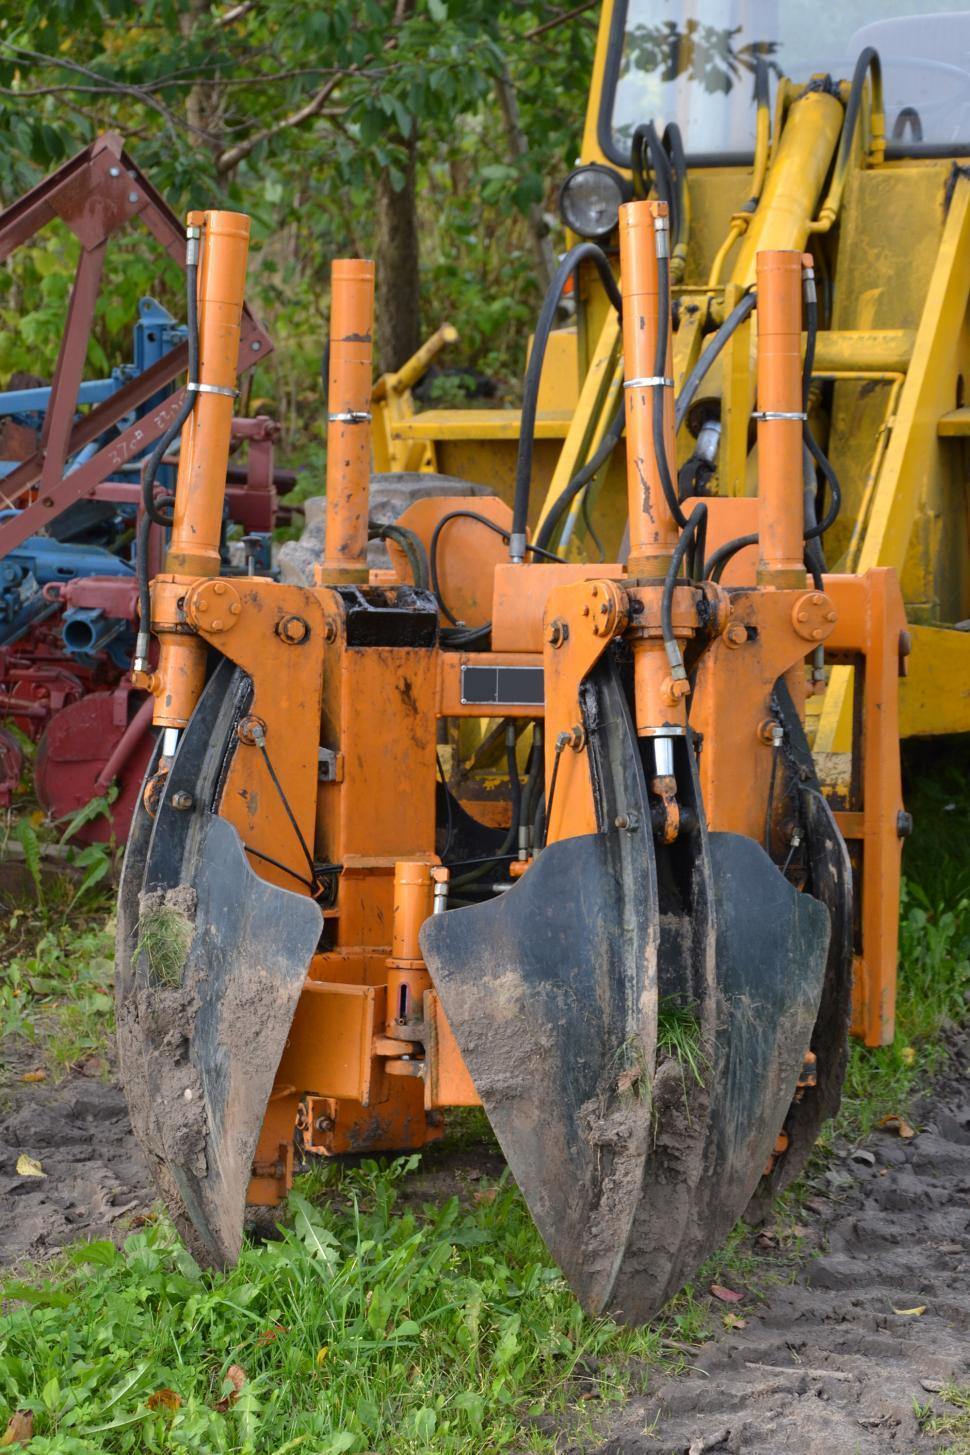 Download Free Stock HD Photo of Hydraulic tree transplanting spades Online